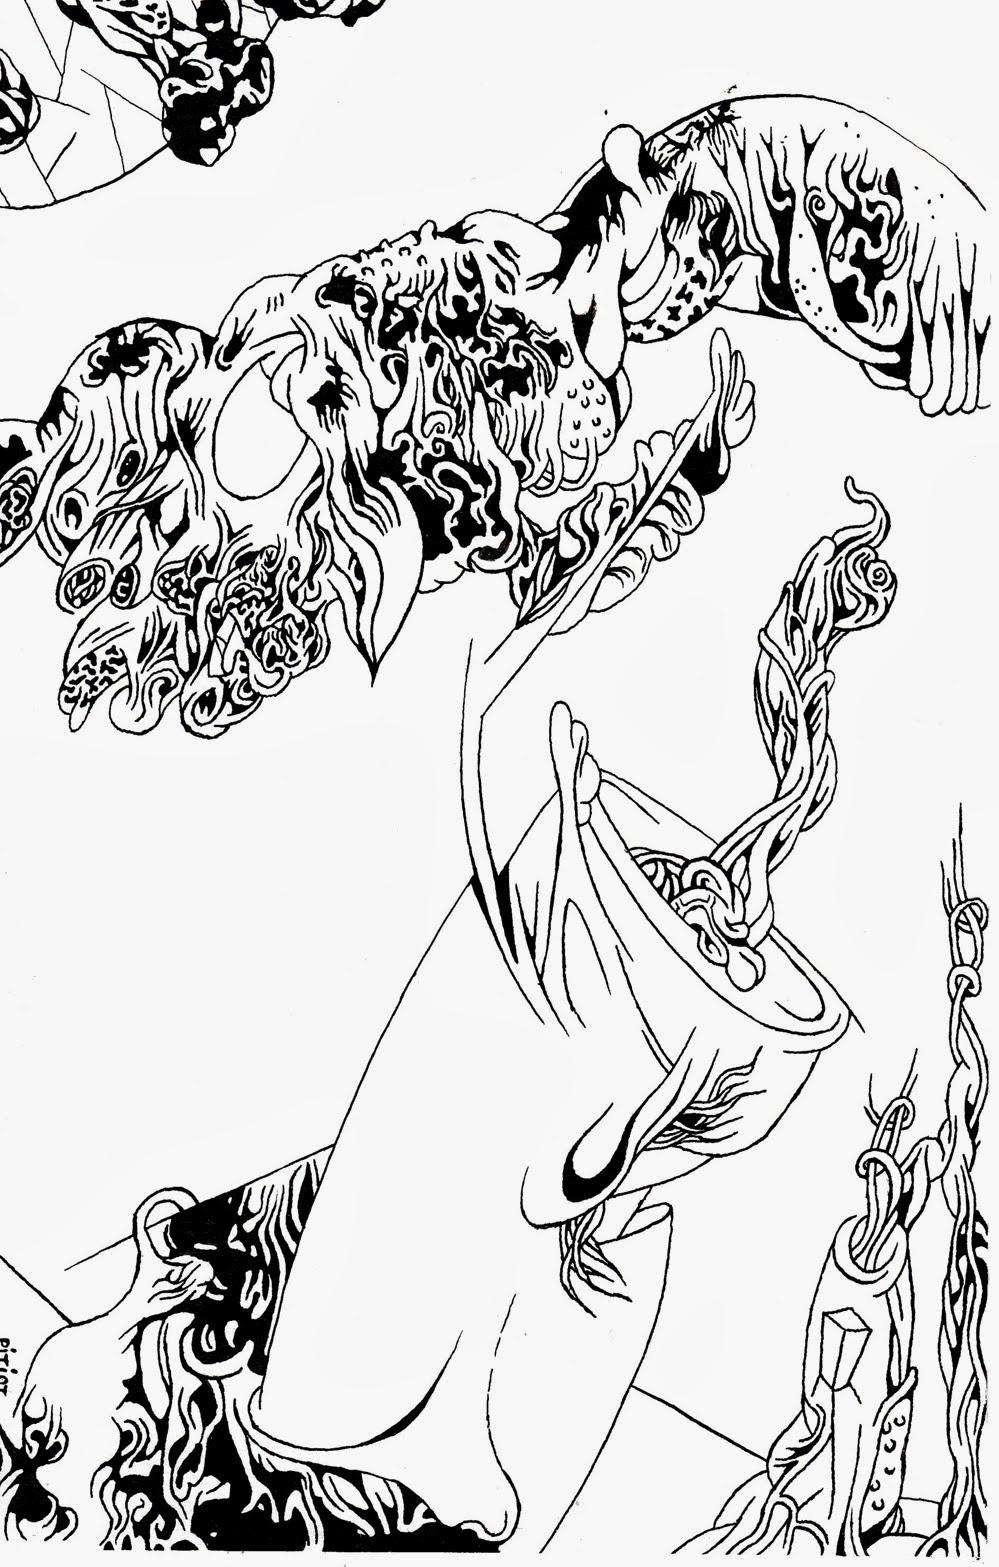 Paul Bunyan Coloring Pages Paul Bunyan Coloring Page